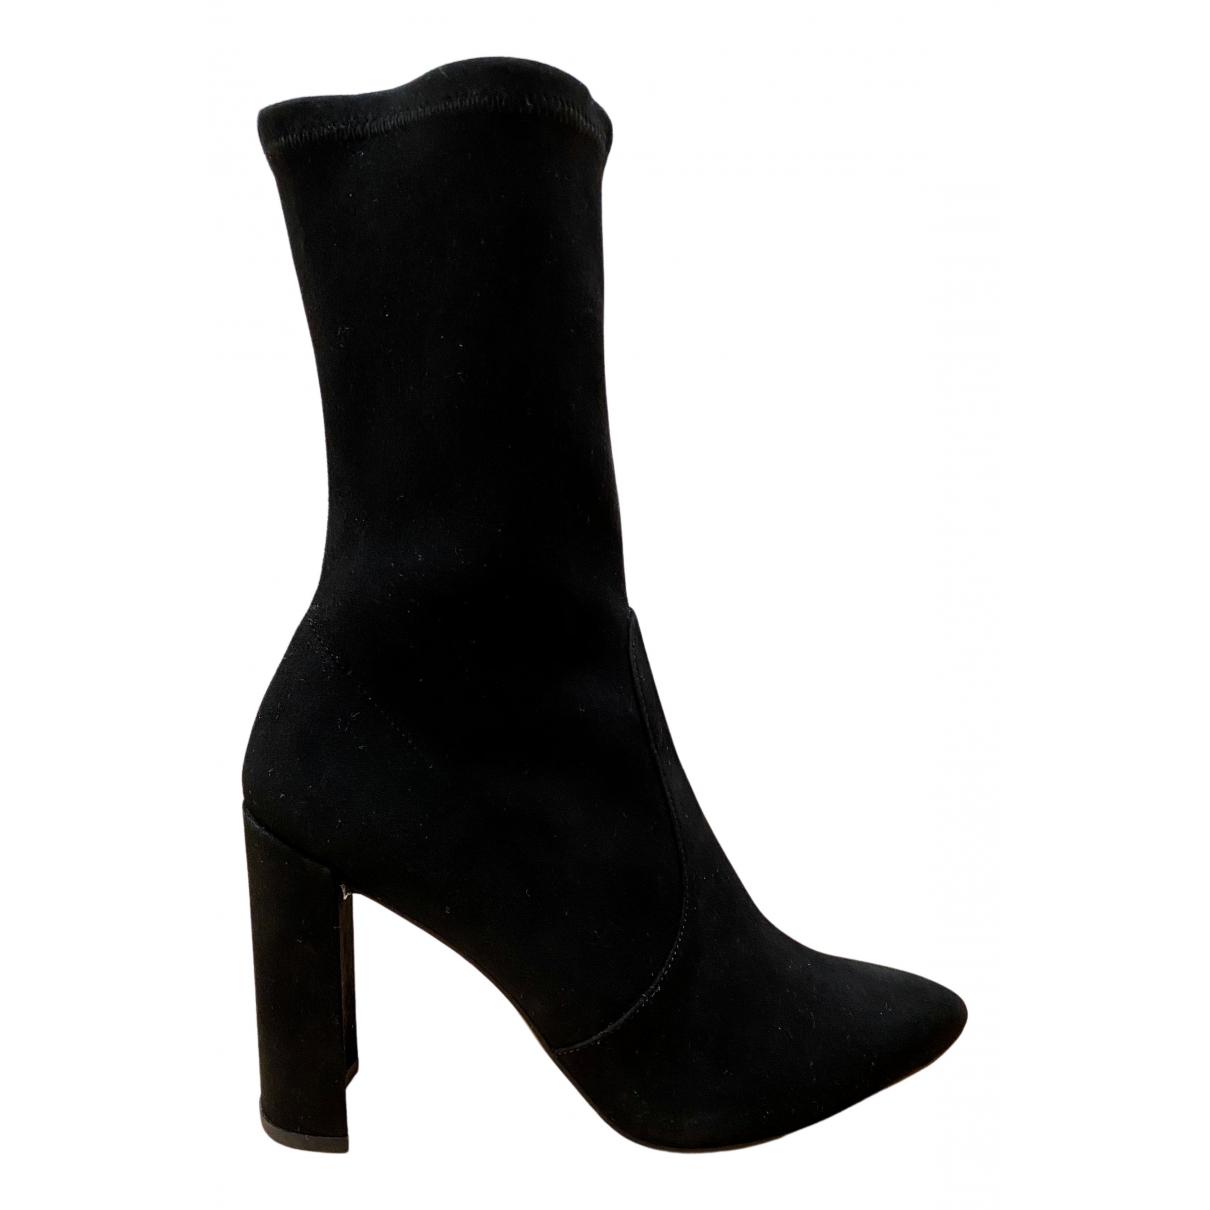 Stuart Weitzman N Black Suede Boots for Women 38.5 EU